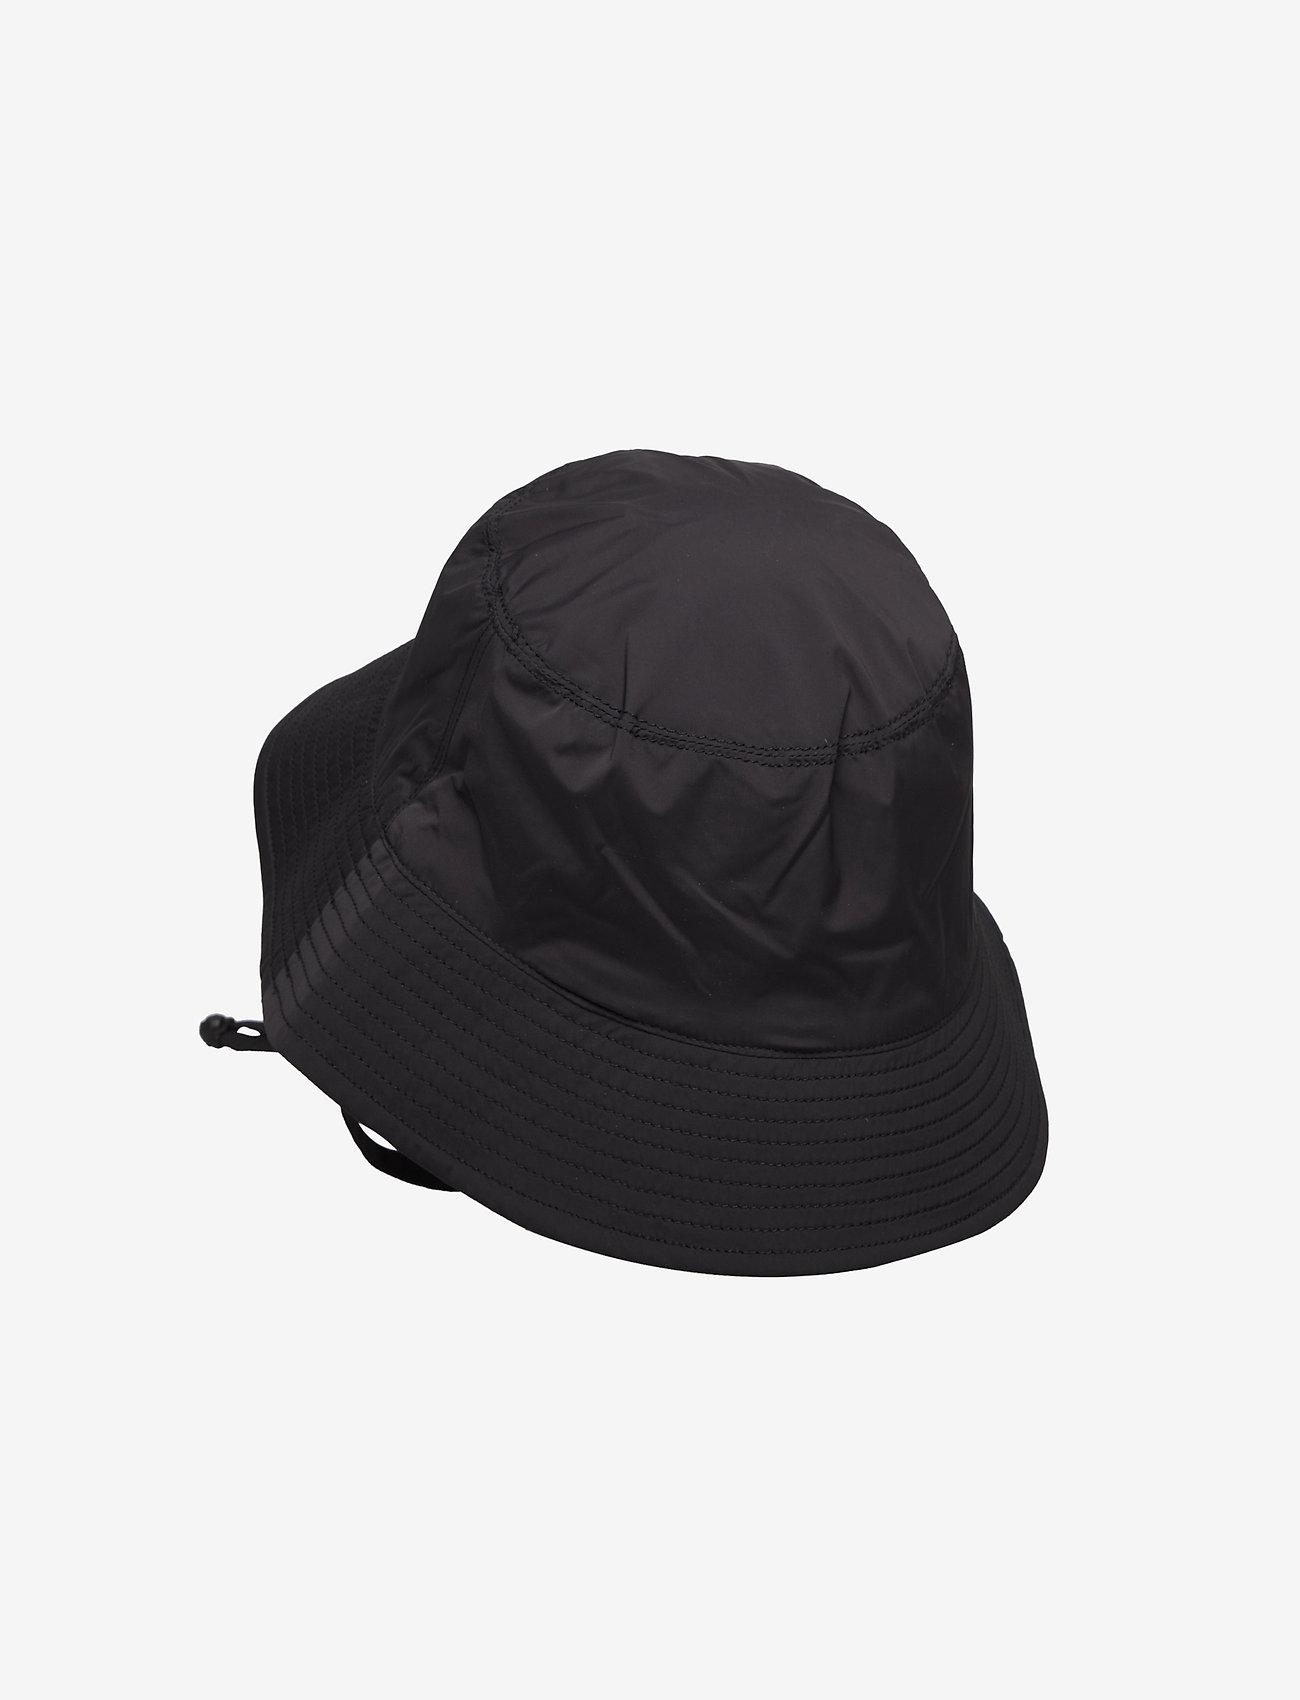 Closed - mens accessories - czapki i kapelusze - black - 1